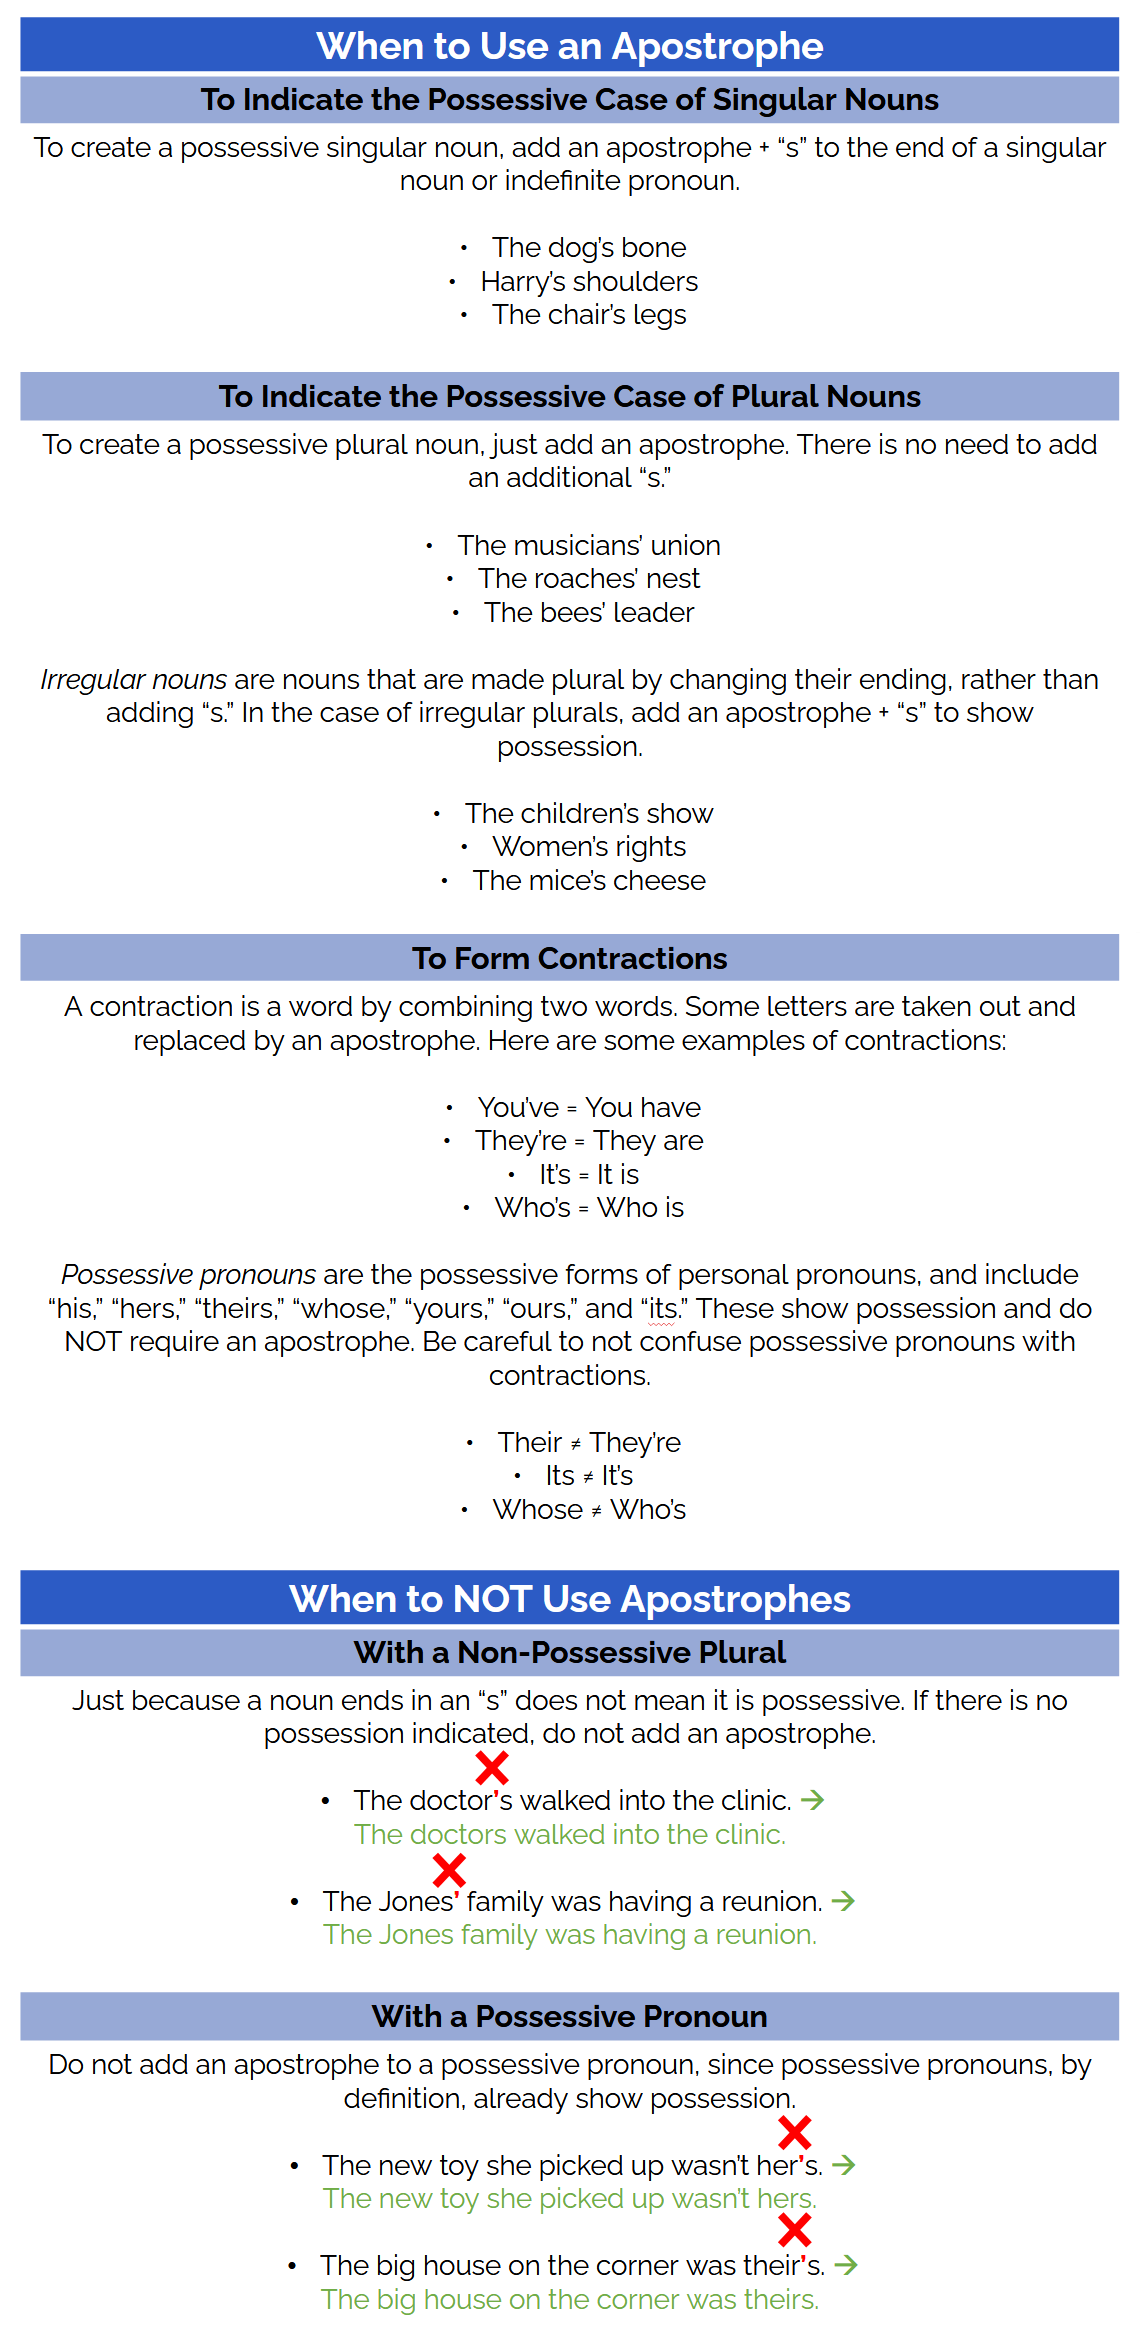 ACT grammar practice: apostrophe usage